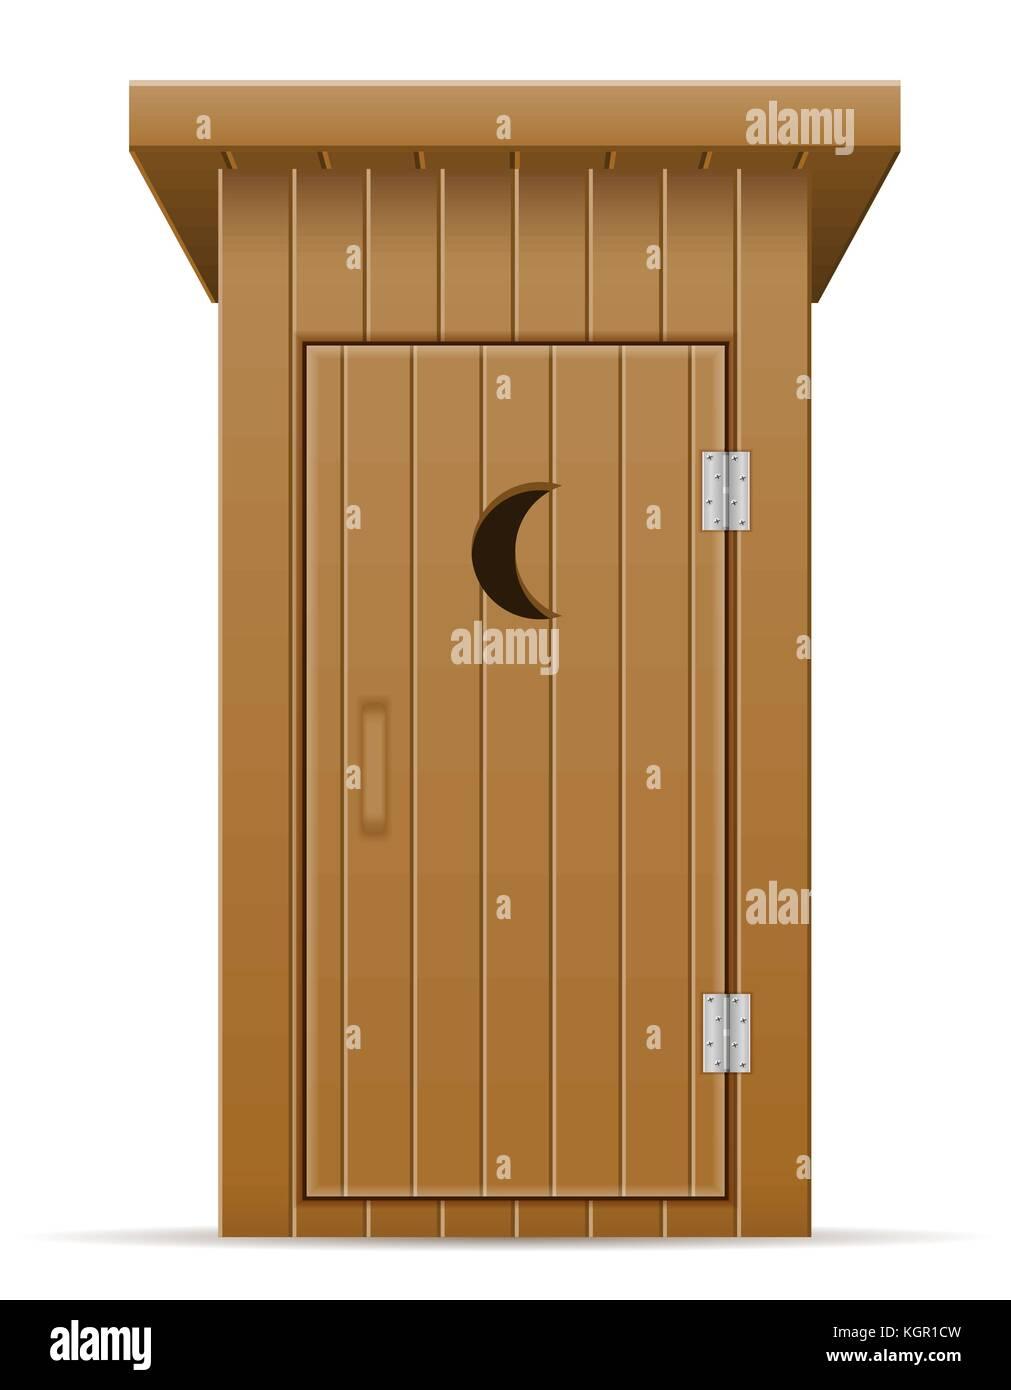 portable urinal stockfotos portable urinal bilder alamy. Black Bedroom Furniture Sets. Home Design Ideas